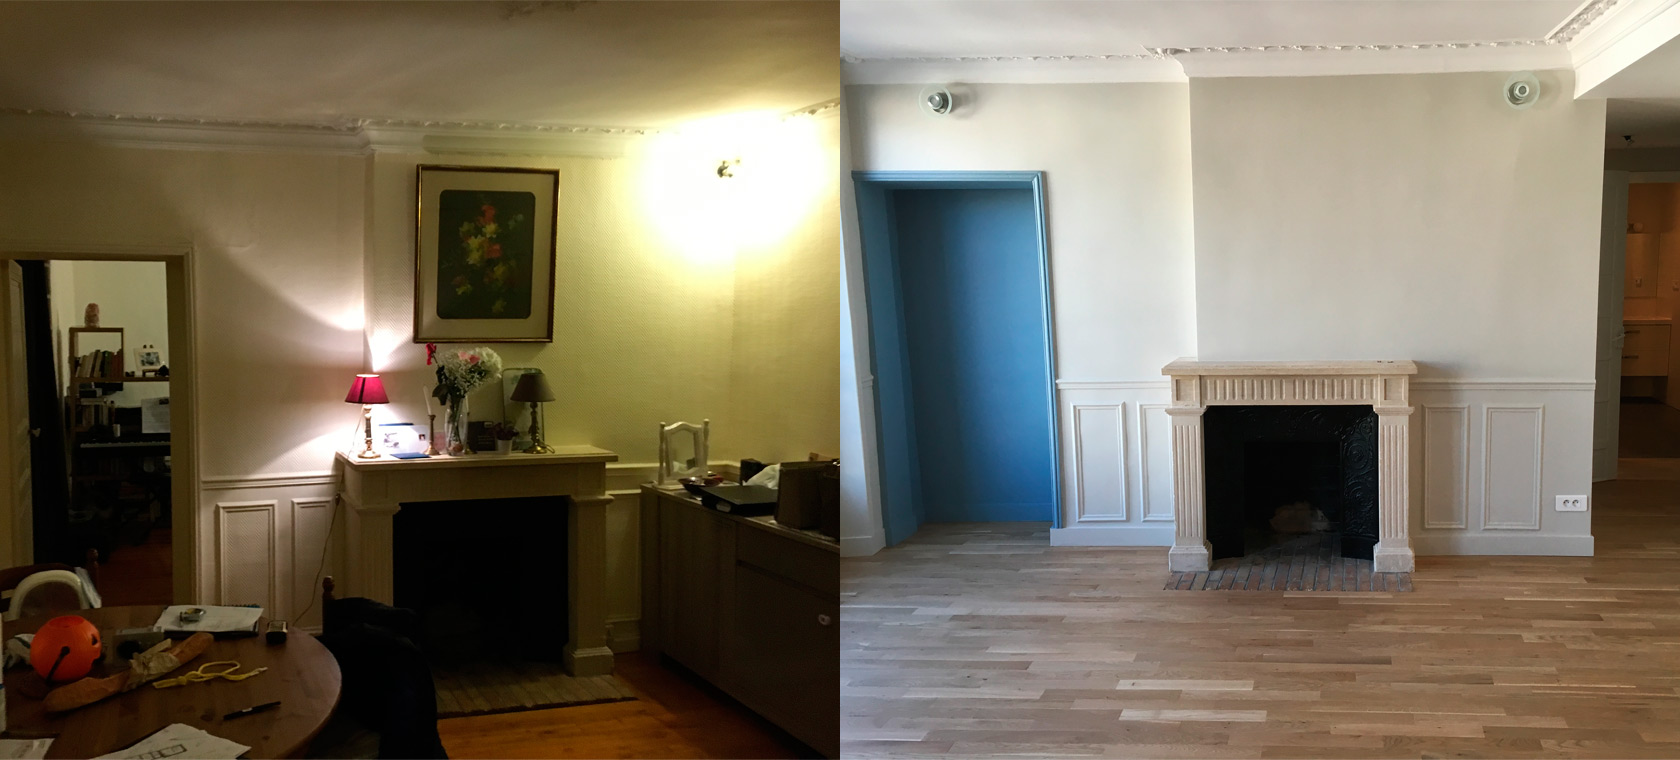 Rénovation appartement charme Chantilly salon